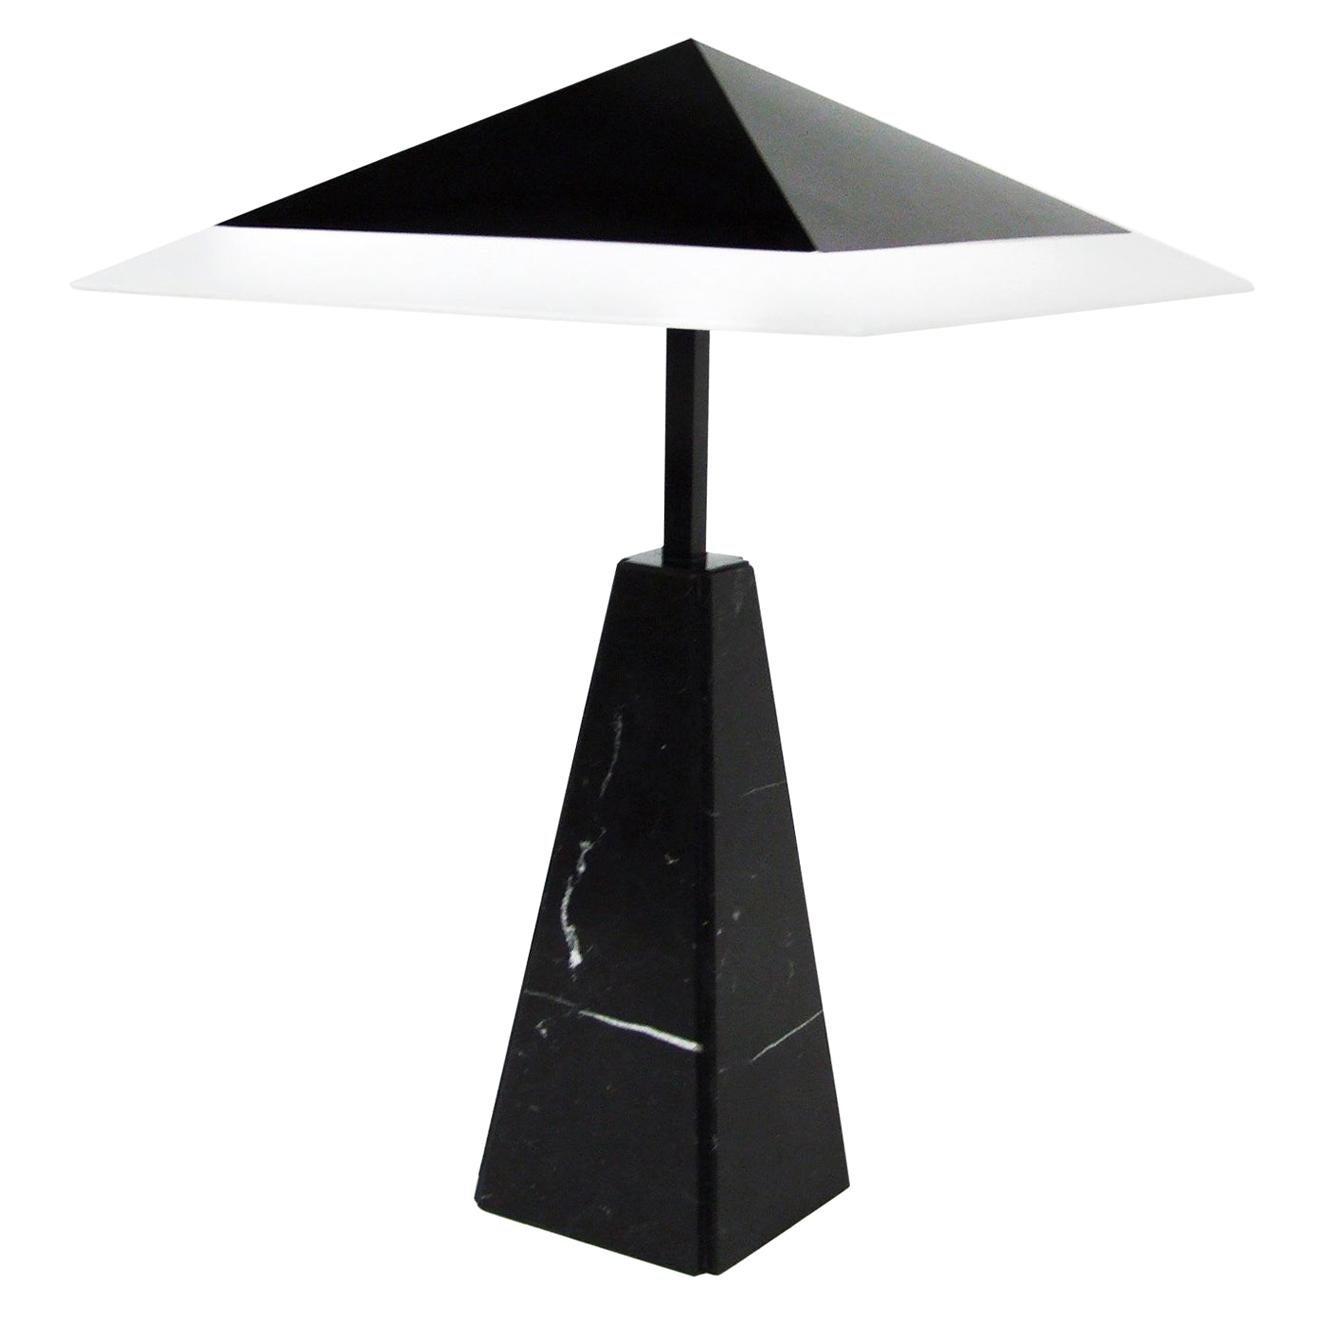 1970s Abat Jour Marble Table Lamp by Cini Boeri for Arteluce